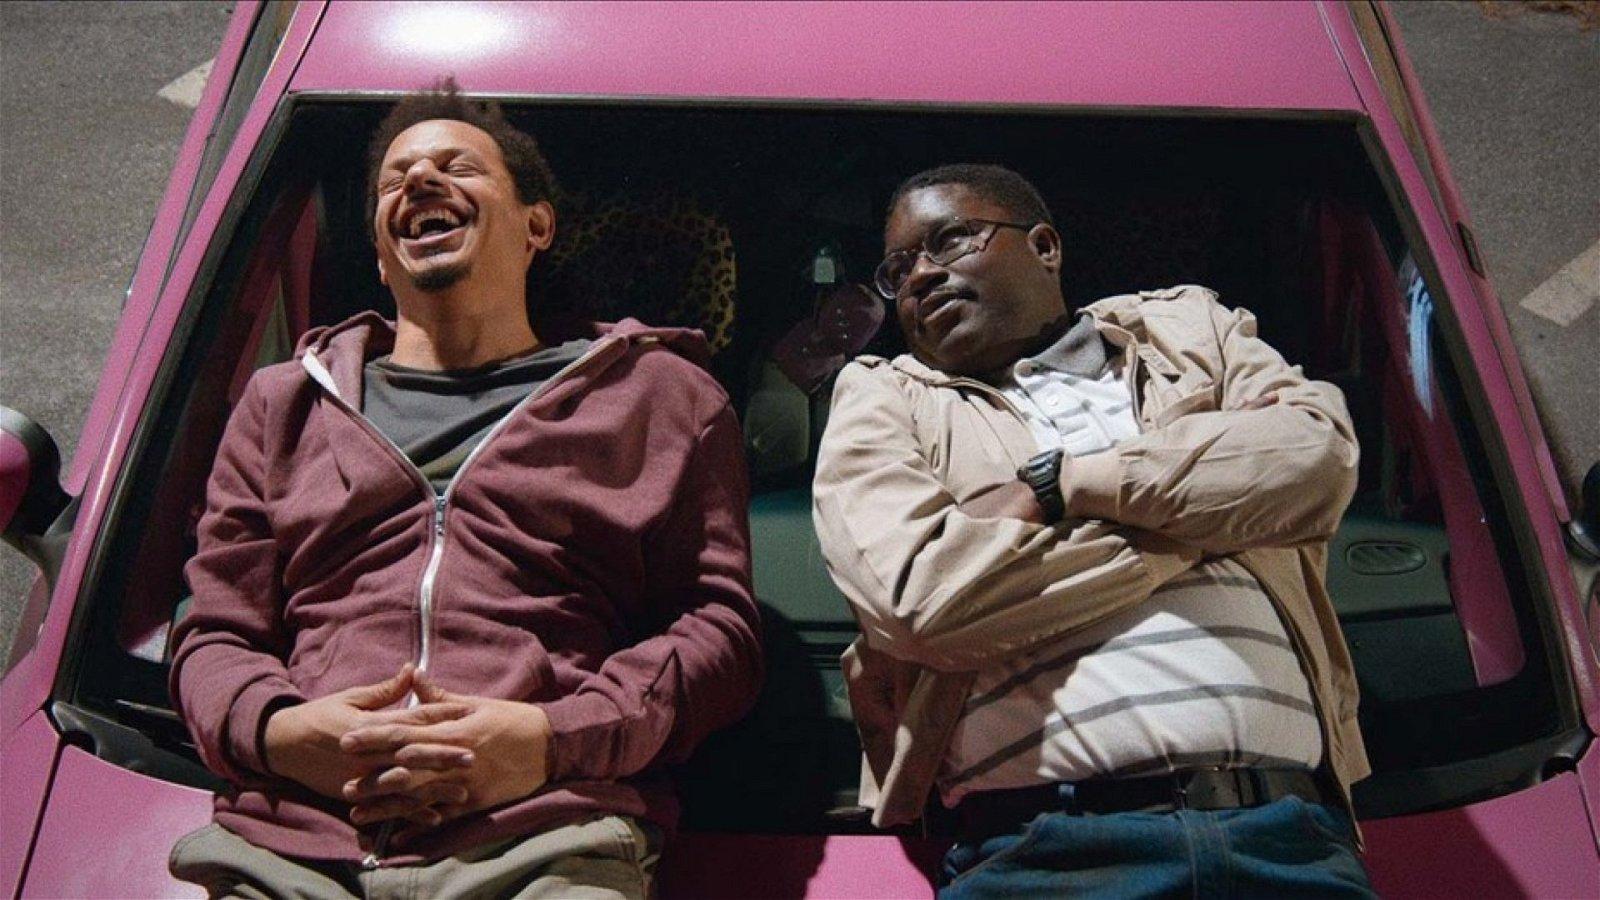 Bad Trip (2021) Review